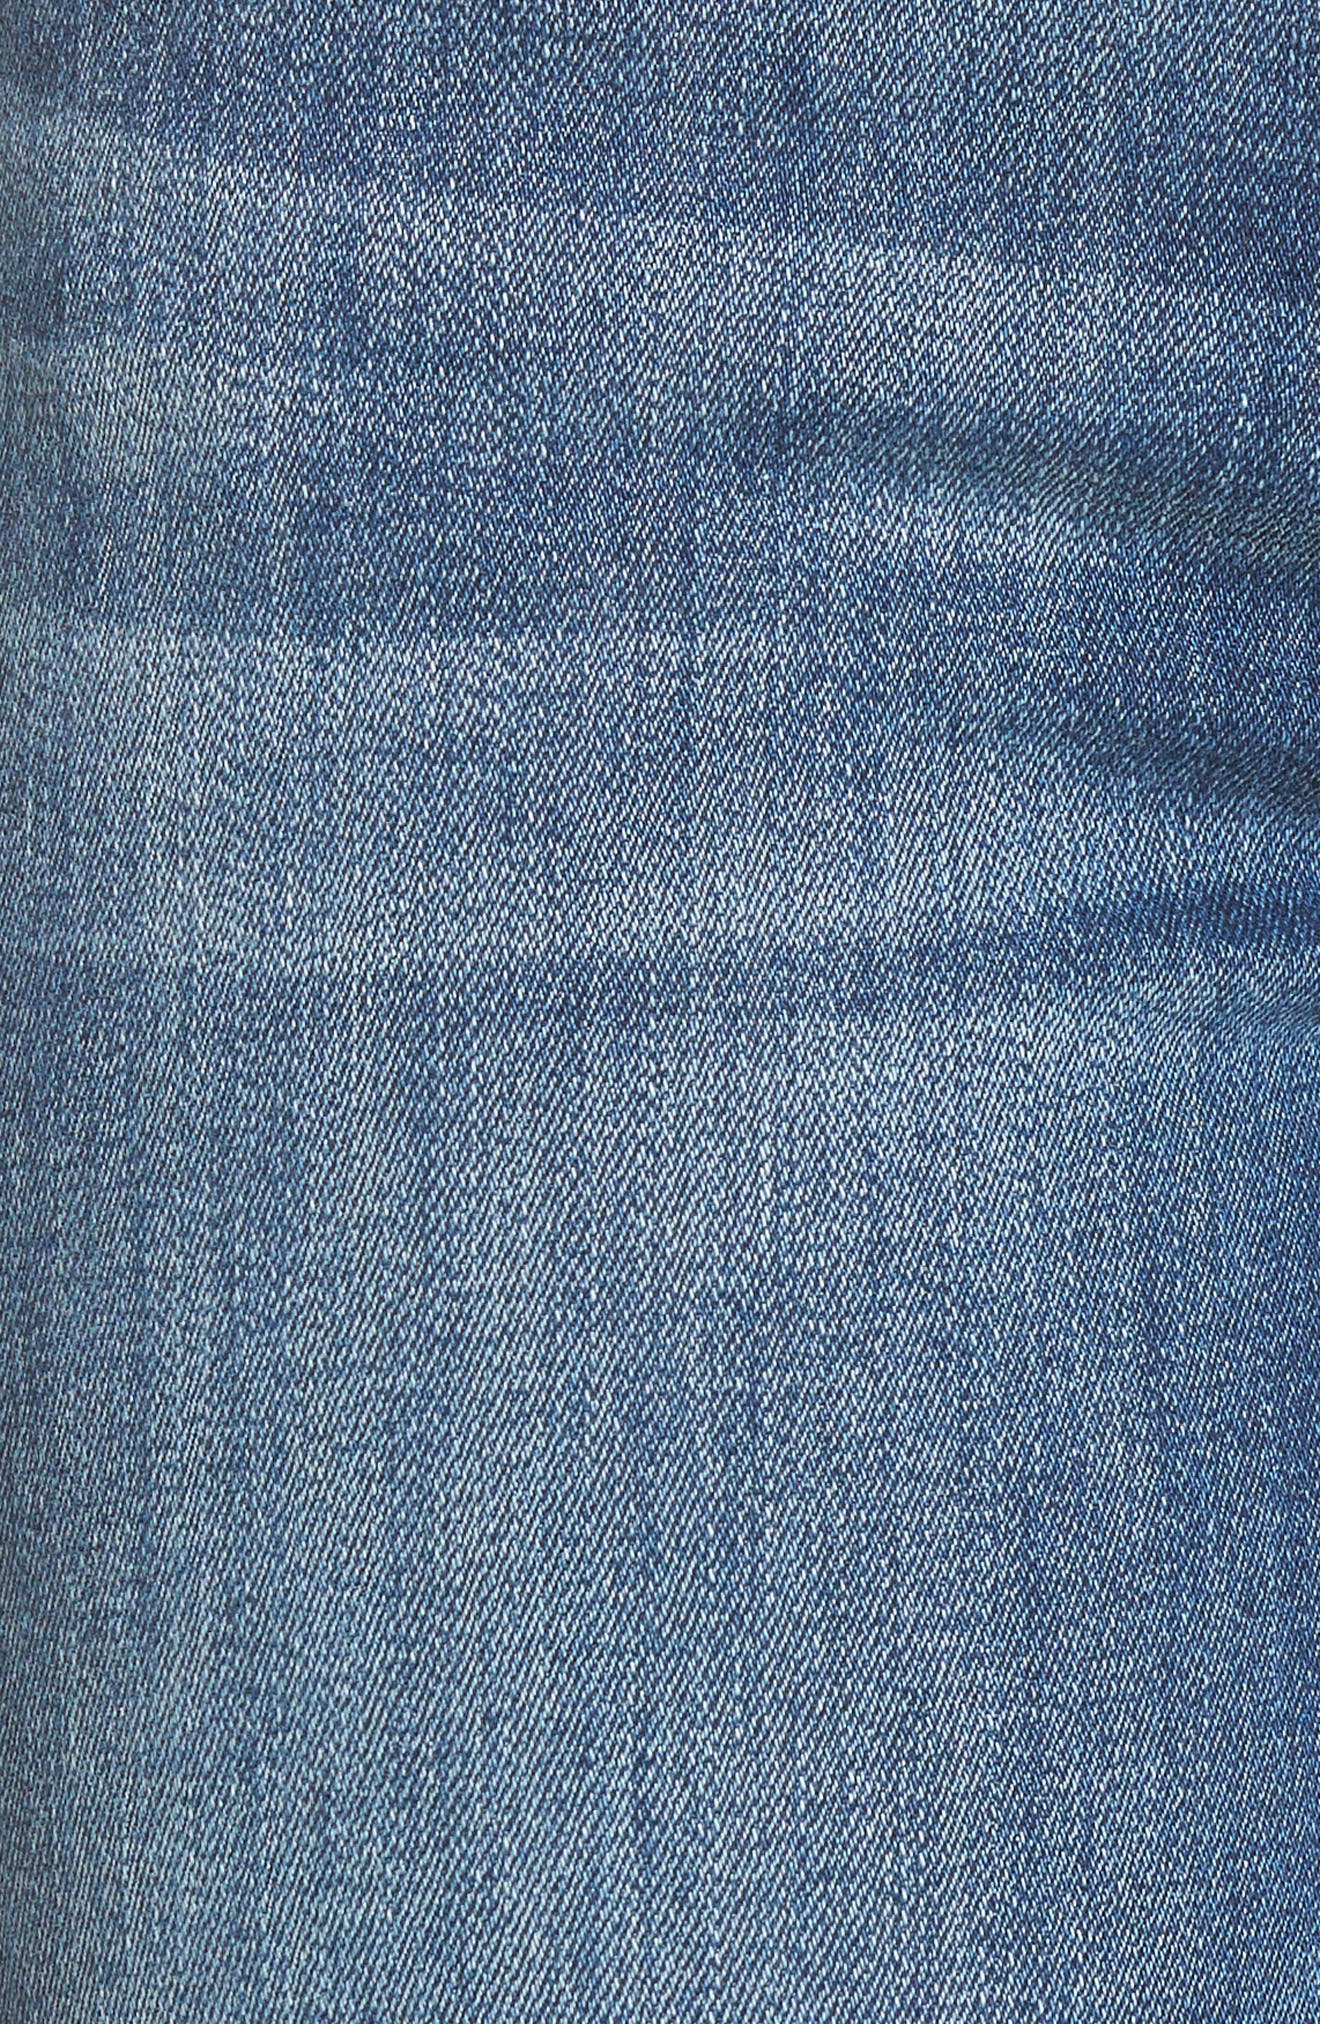 Mara Straight Leg Jeans,                             Alternate thumbnail 6, color,                             425